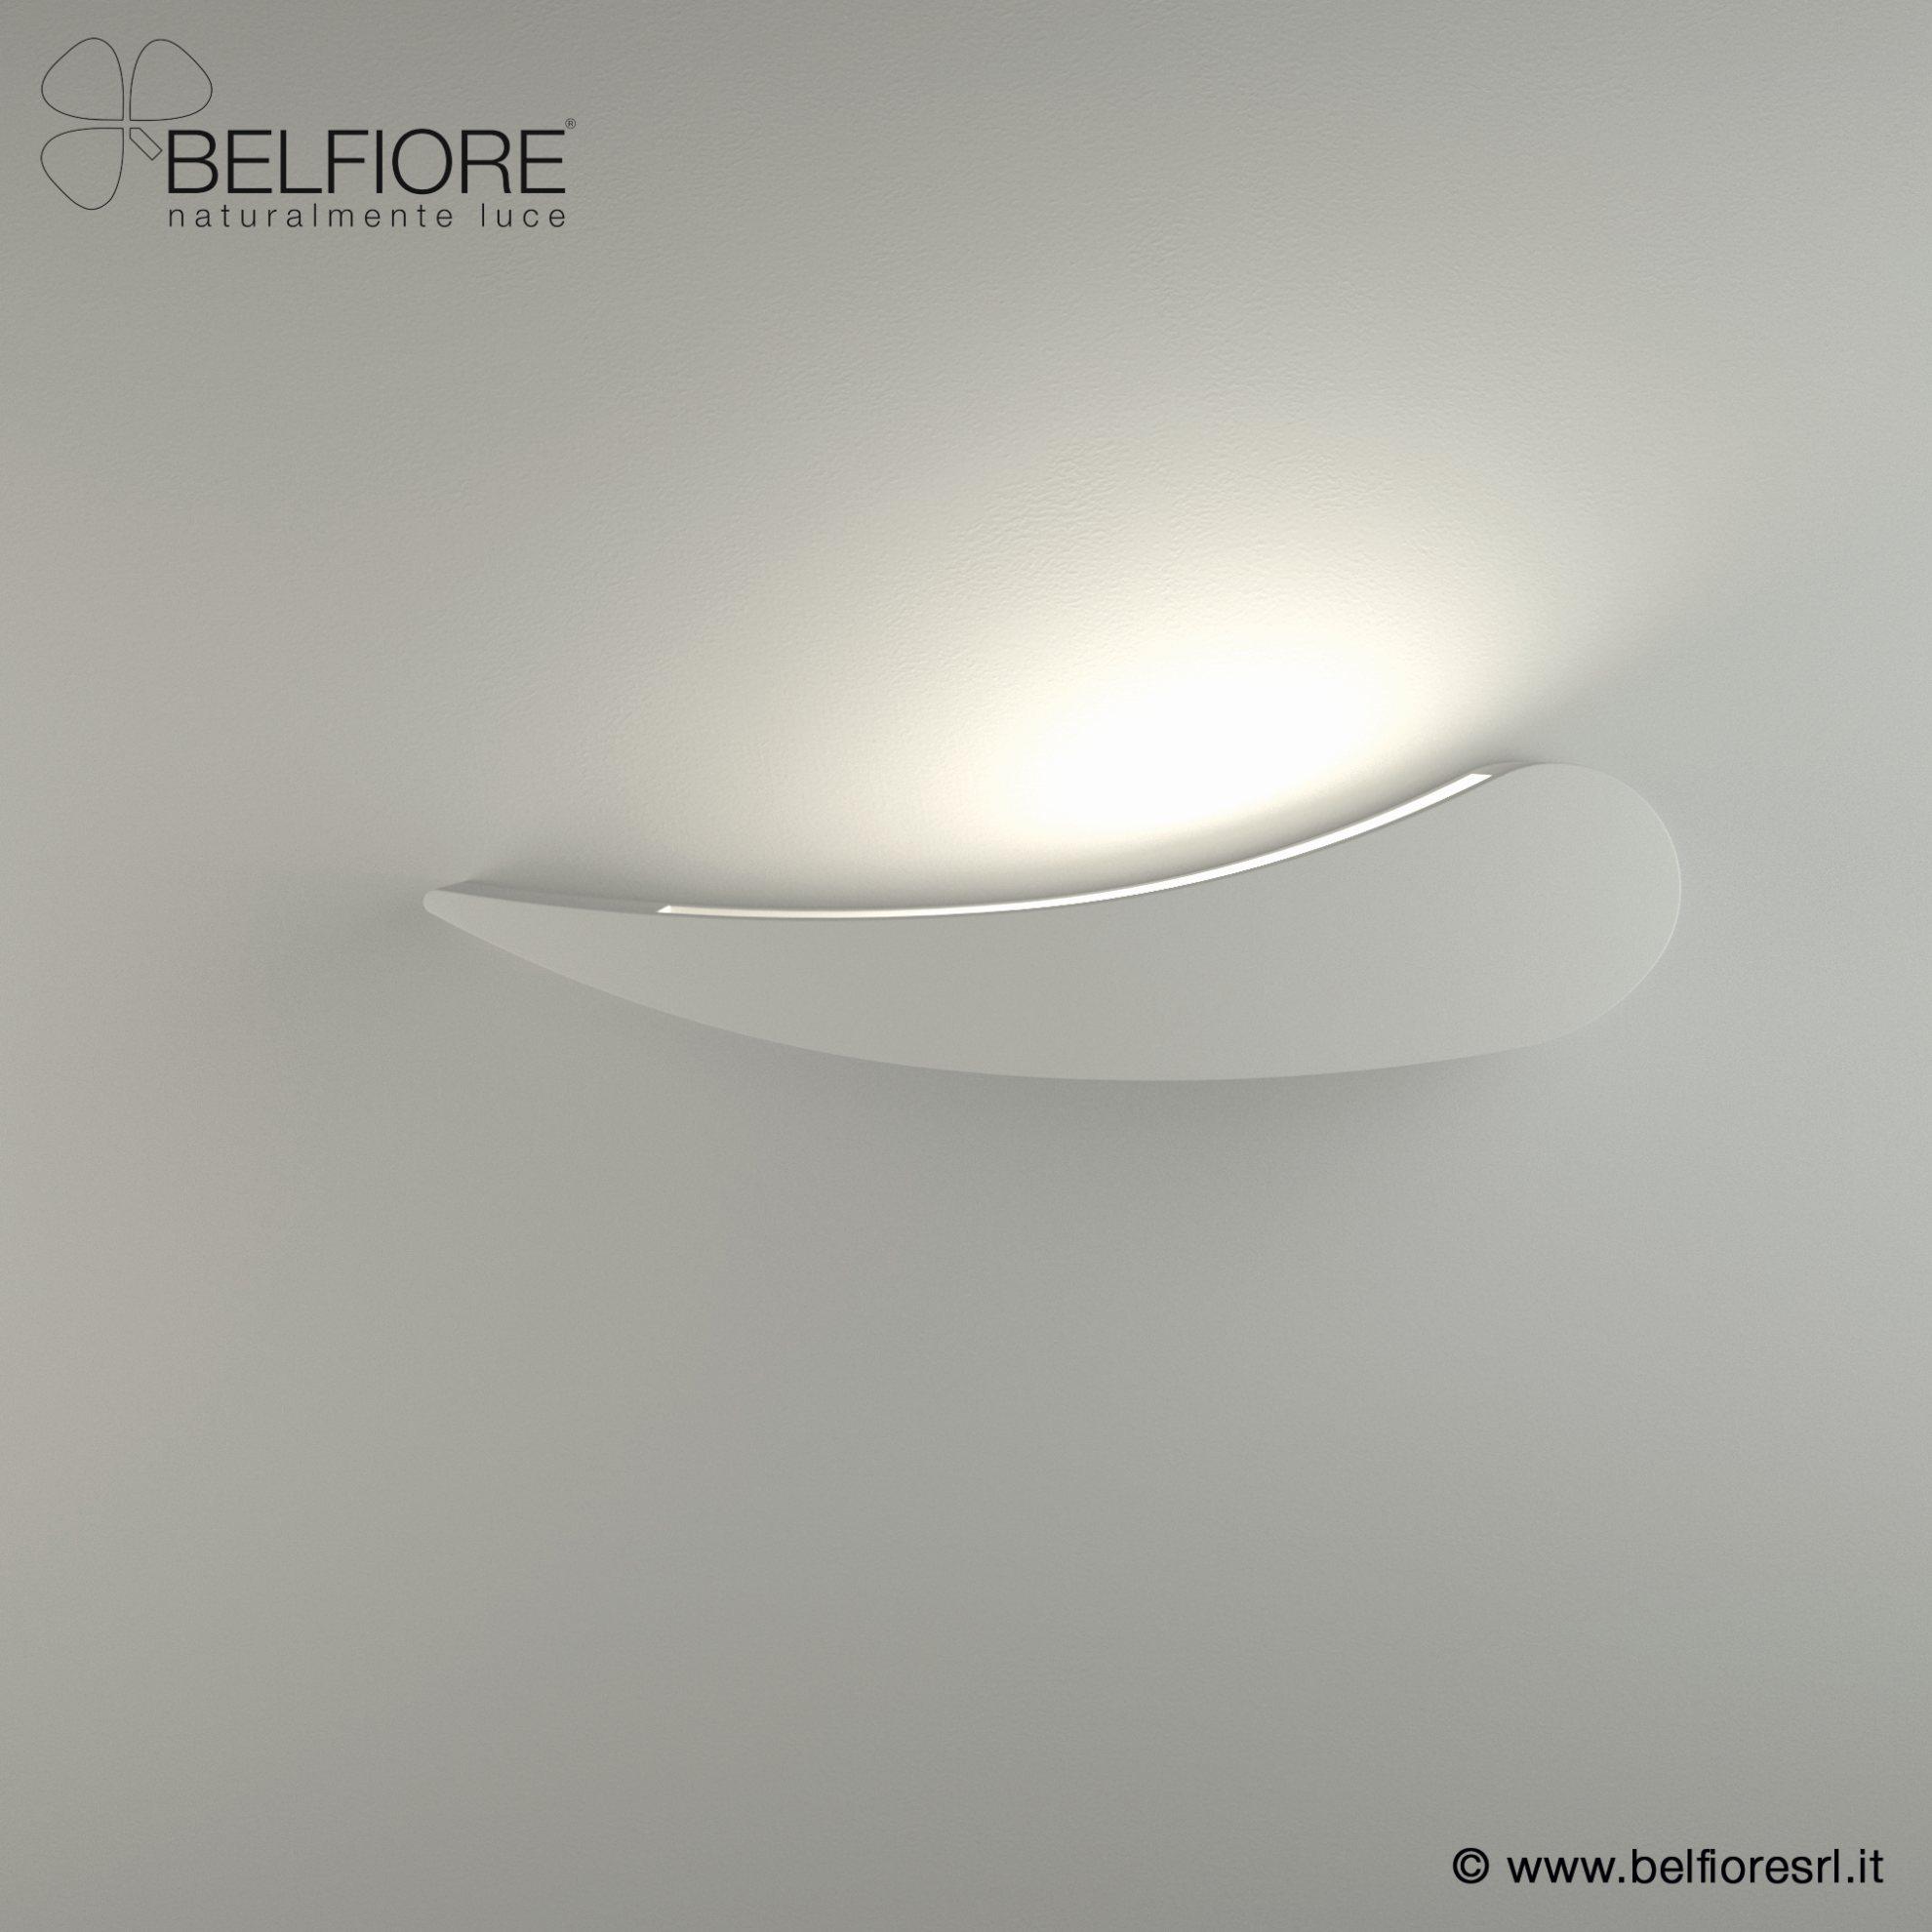 wandlampen aus gips von belfiore. Black Bedroom Furniture Sets. Home Design Ideas